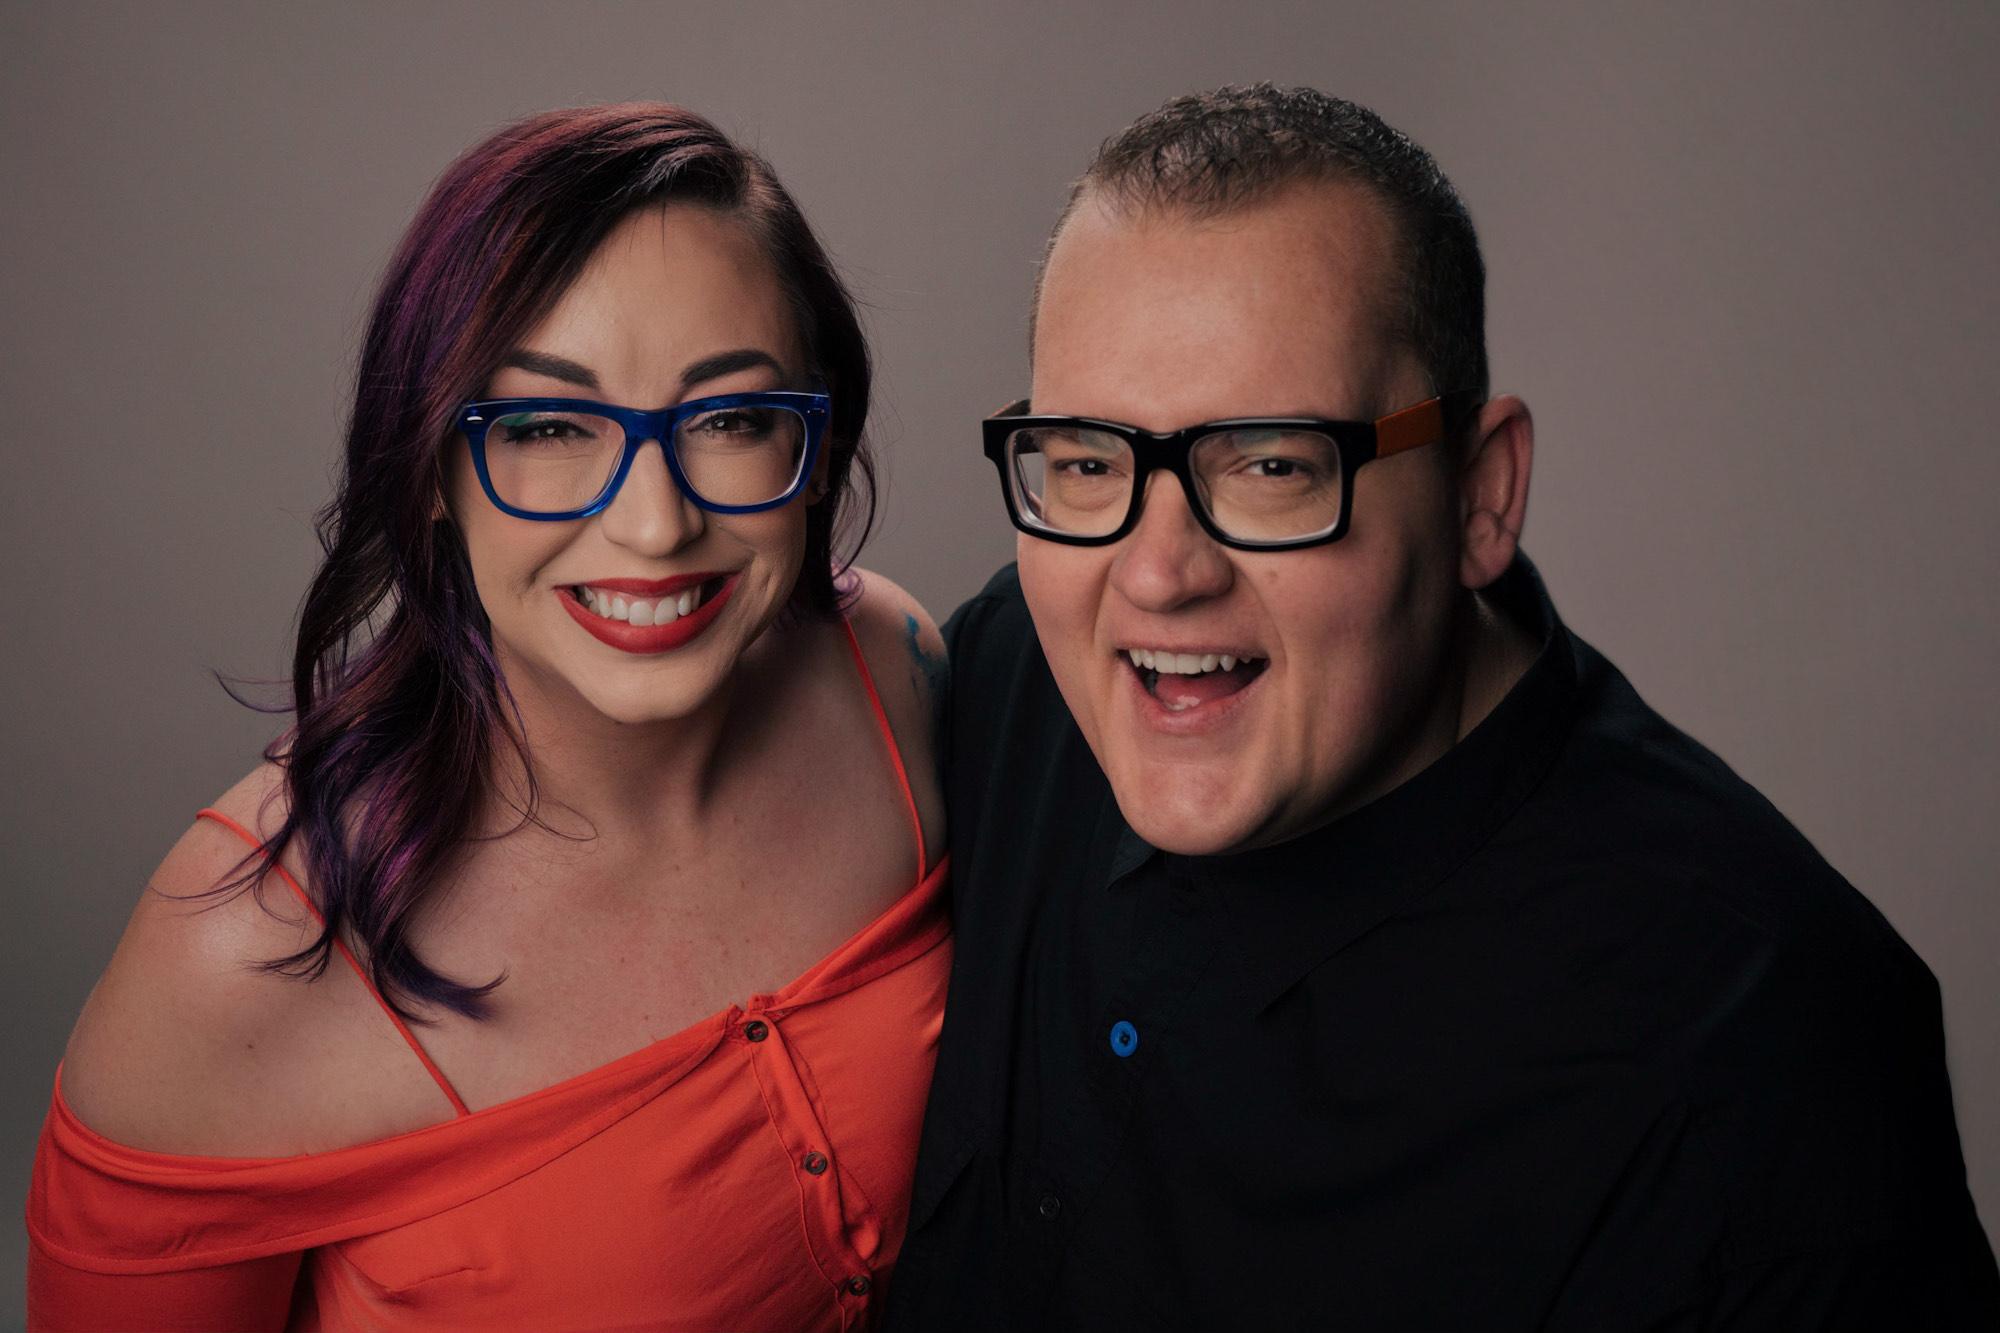 Sony Artisans and Filmmakers, Garrette and Amber Baird of Eyenamics